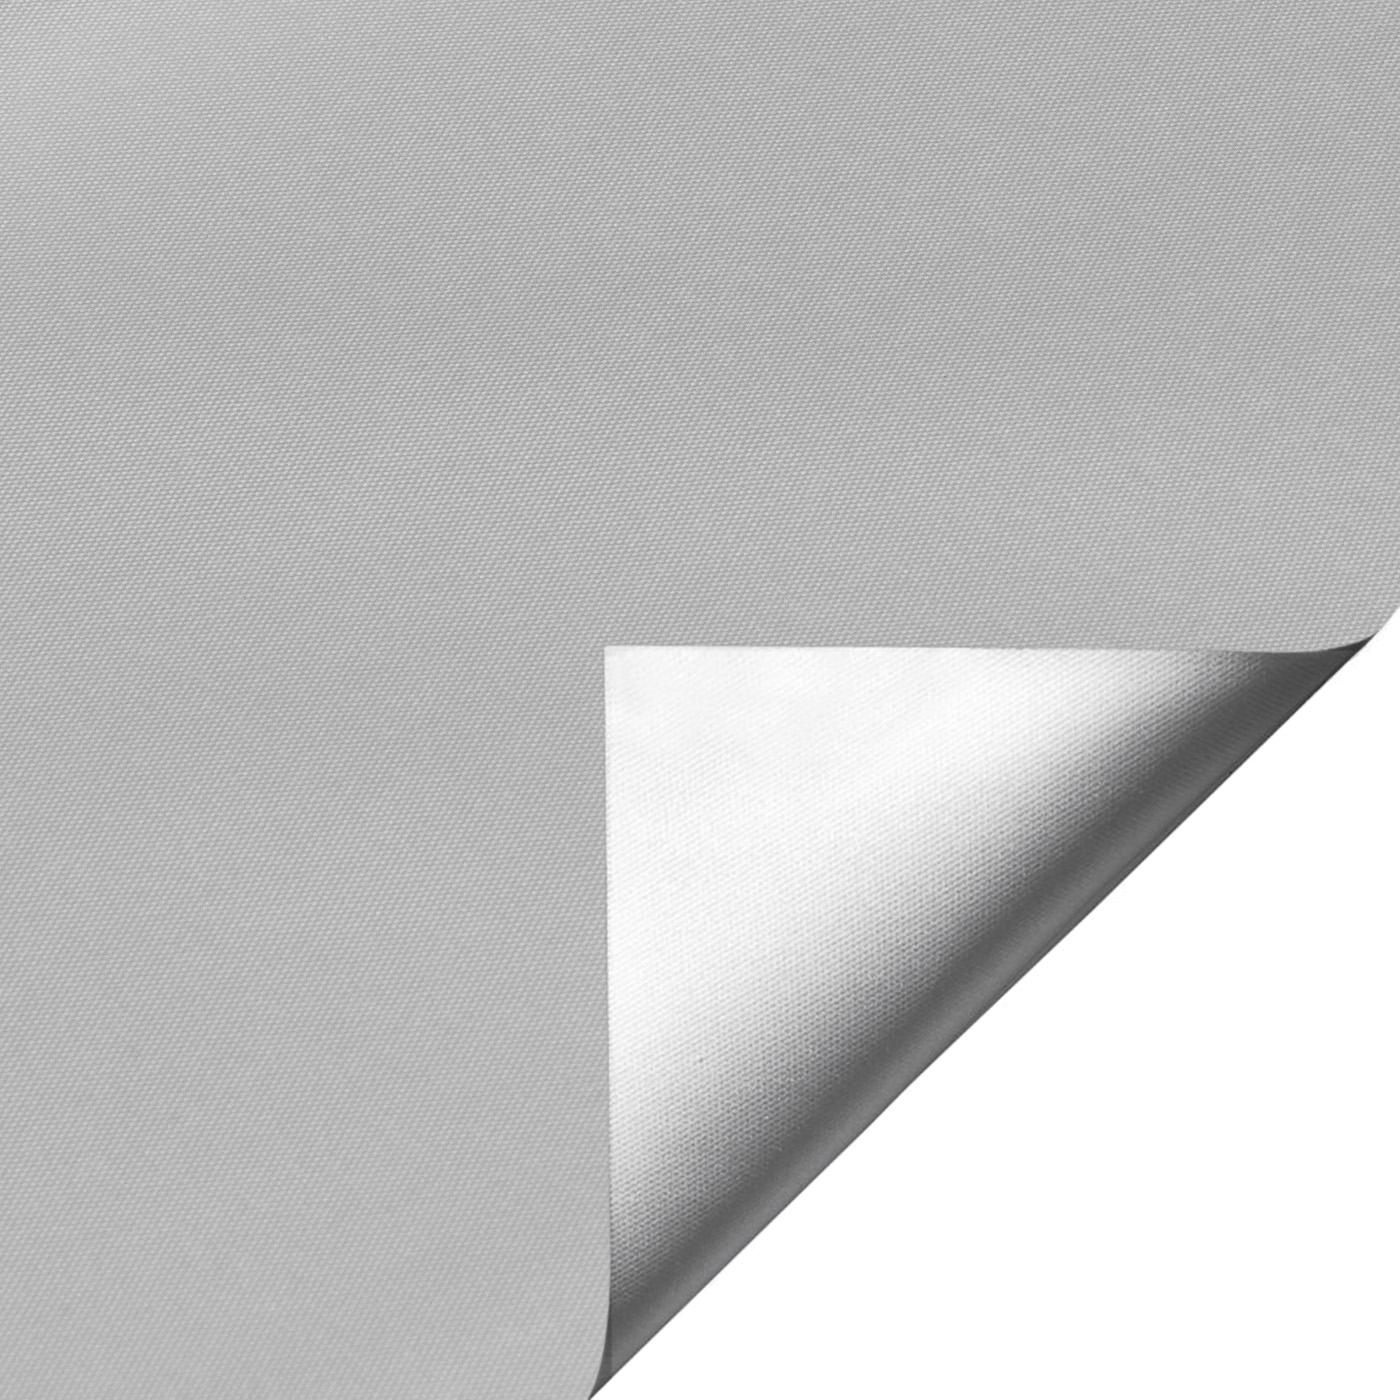 rollo klemmfix verdunkelungsrollo fenster thermorollo klemmtr ger ohne bohren ebay. Black Bedroom Furniture Sets. Home Design Ideas